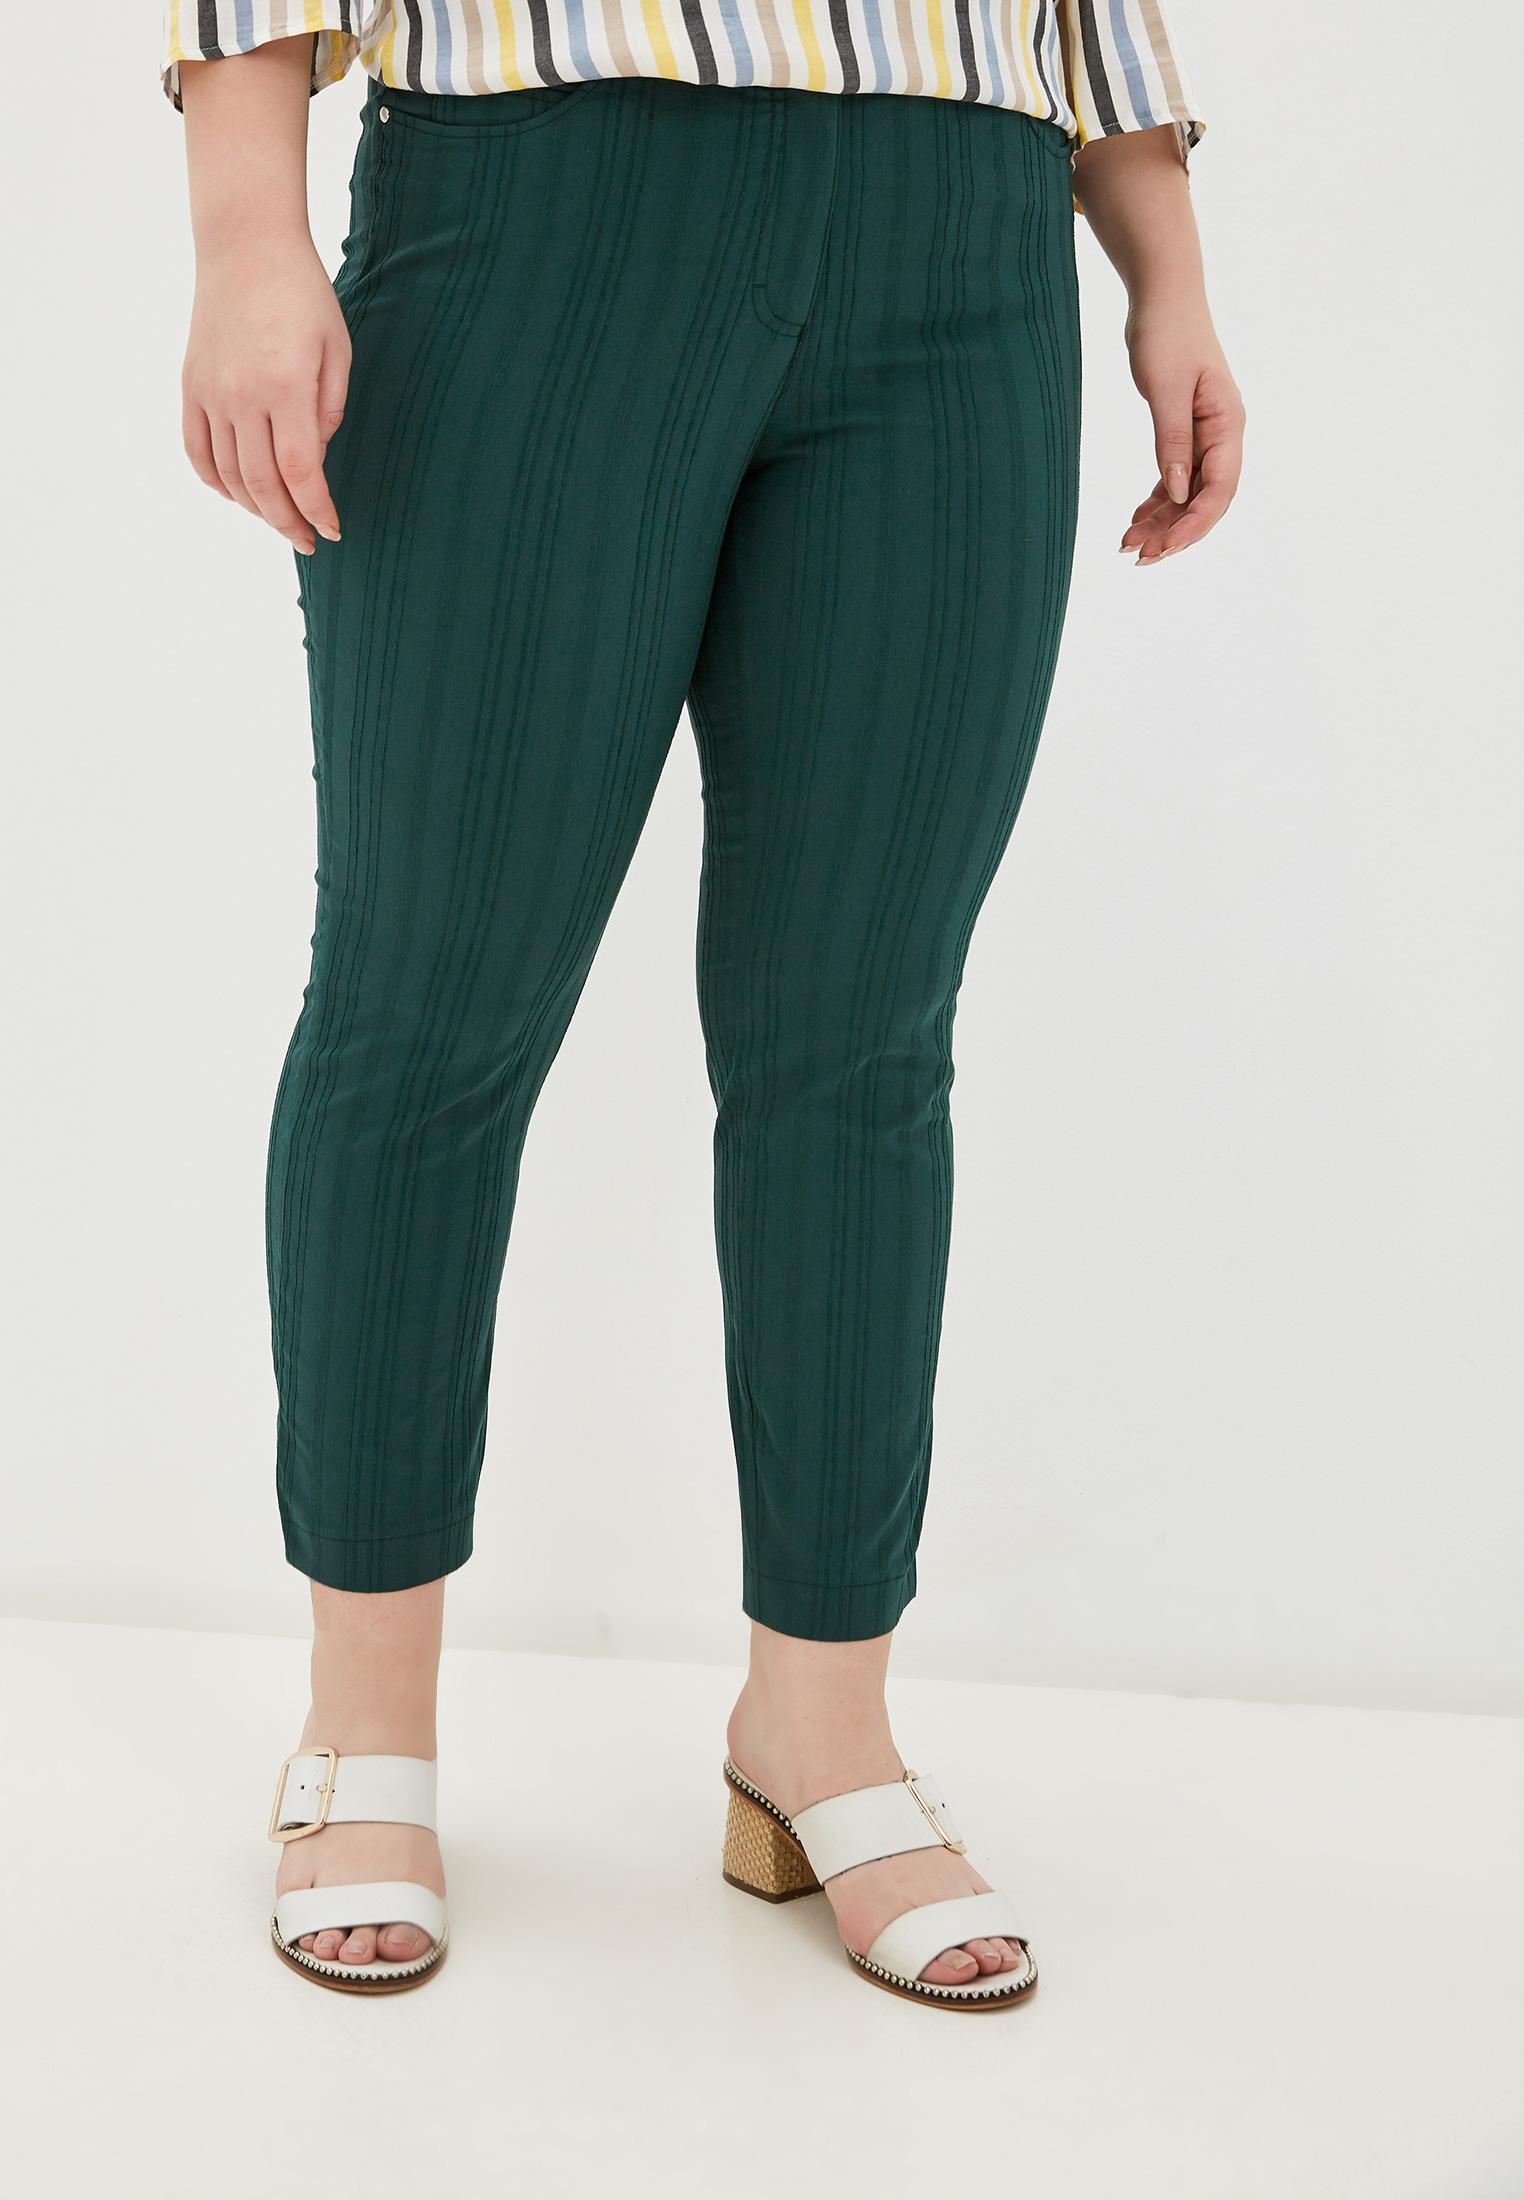 Женские зауженные брюки Samoon by Gerry Weber 220066-21234